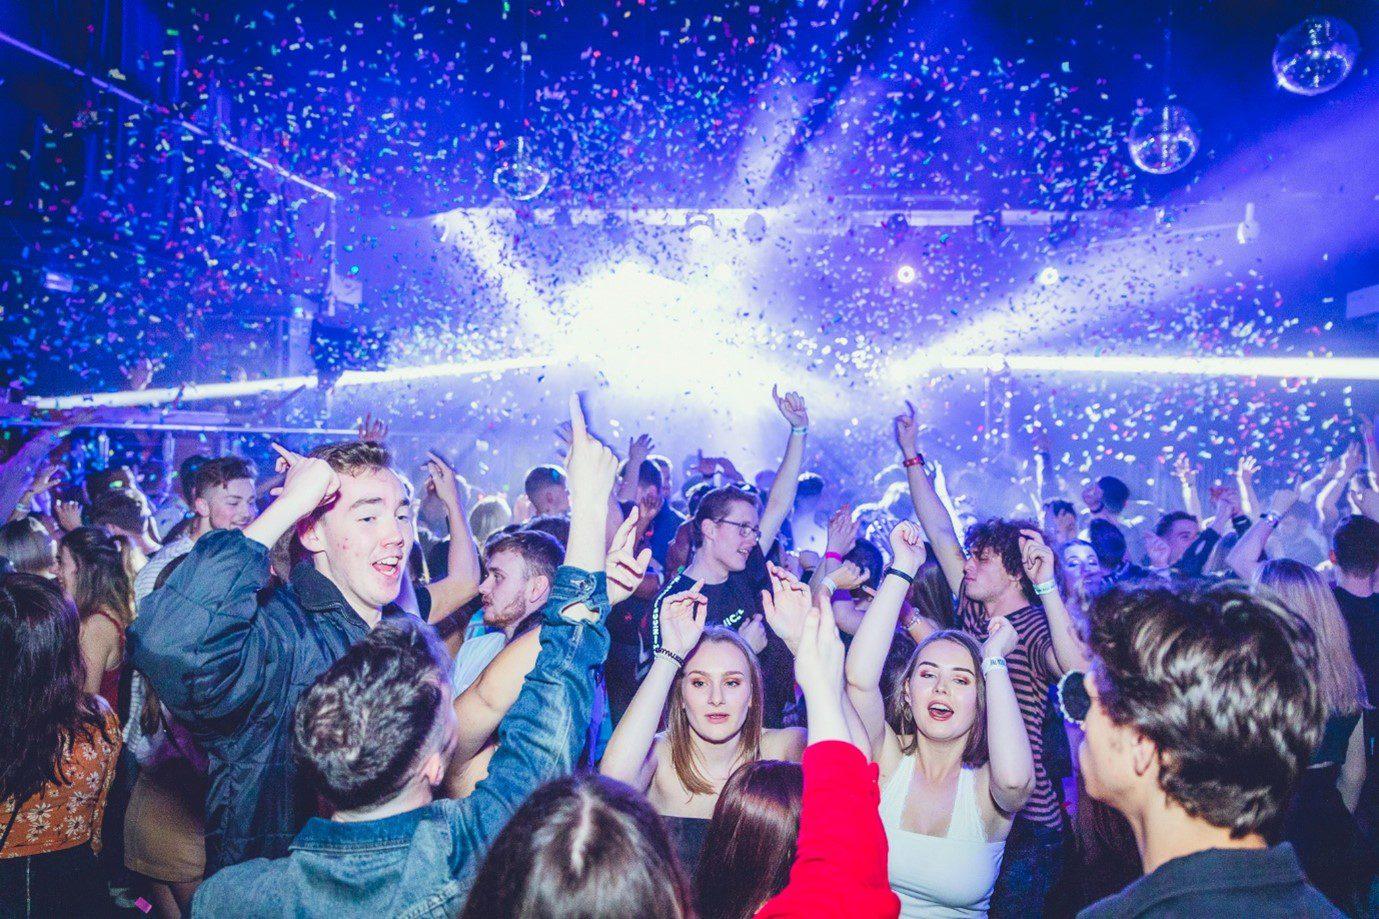 A photo of mono nightclub